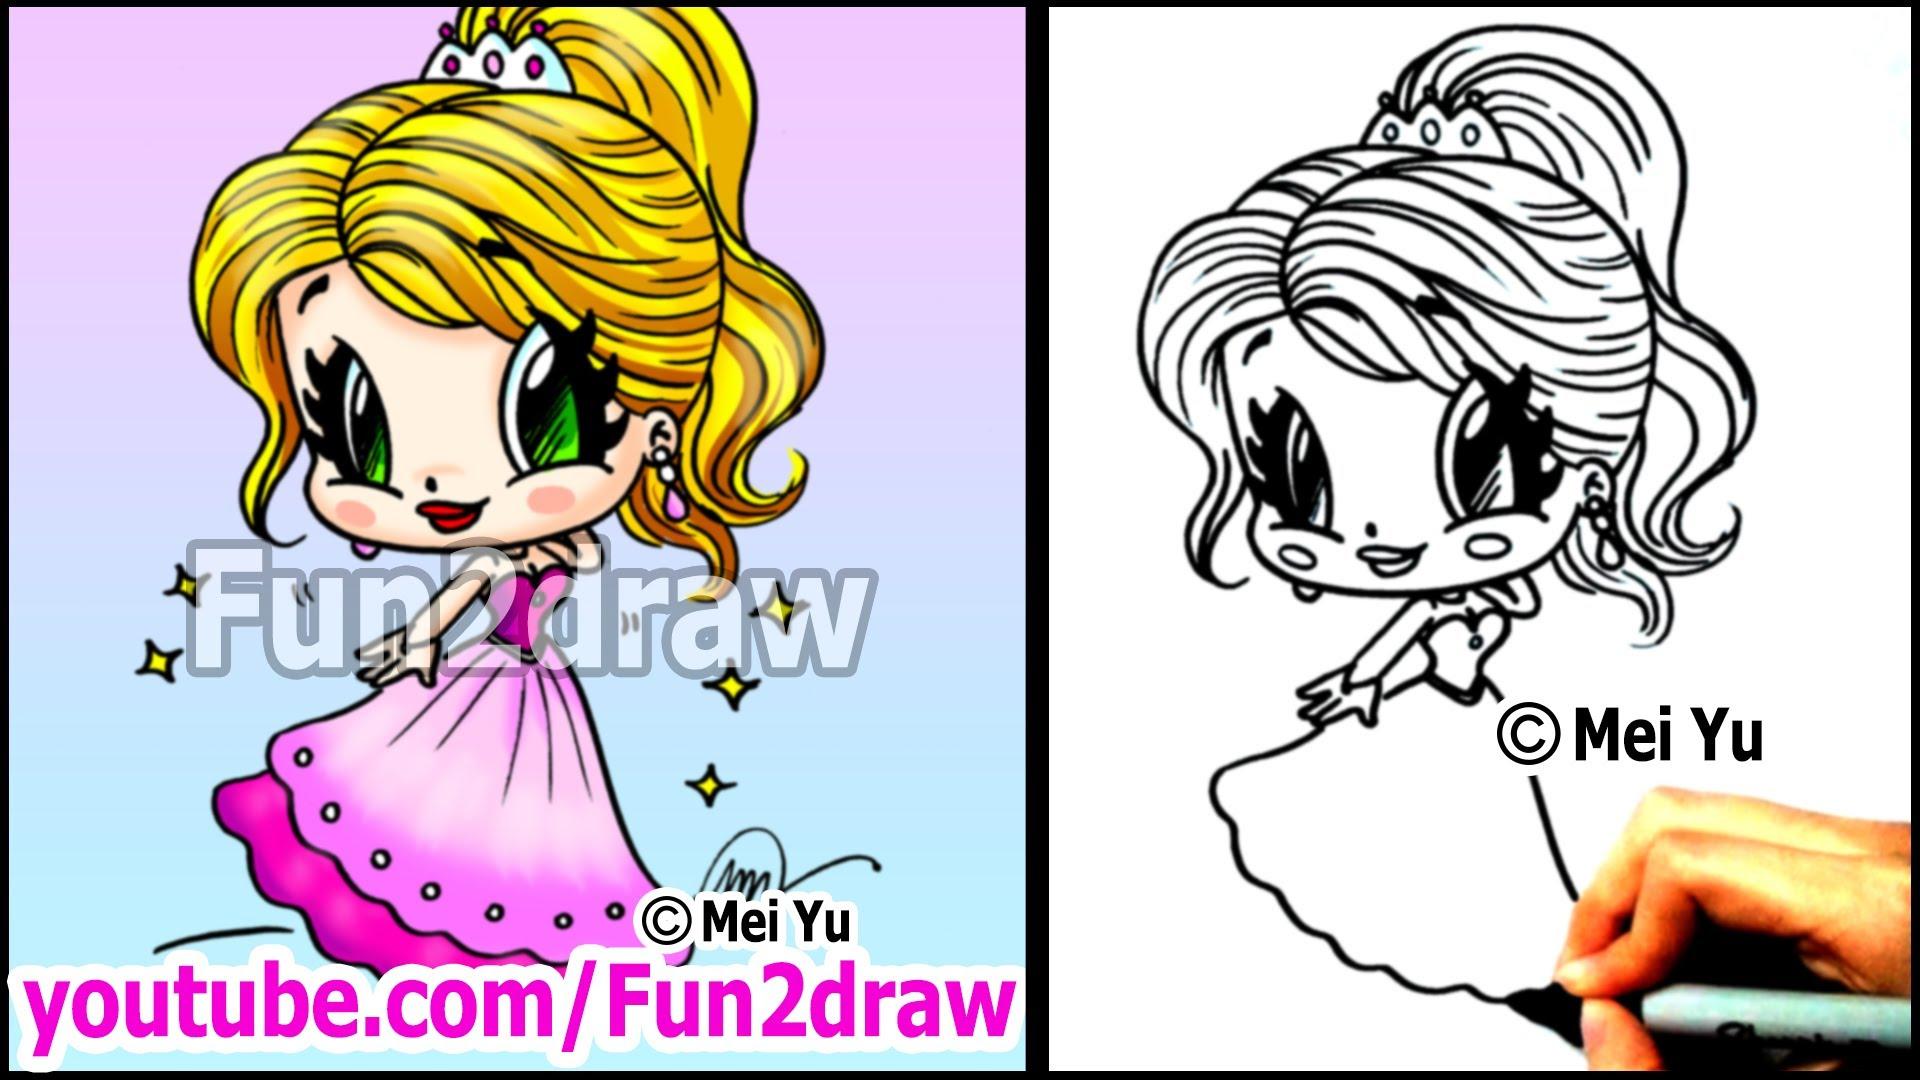 Drawn princess google People Tutorial Prom Cartoon in